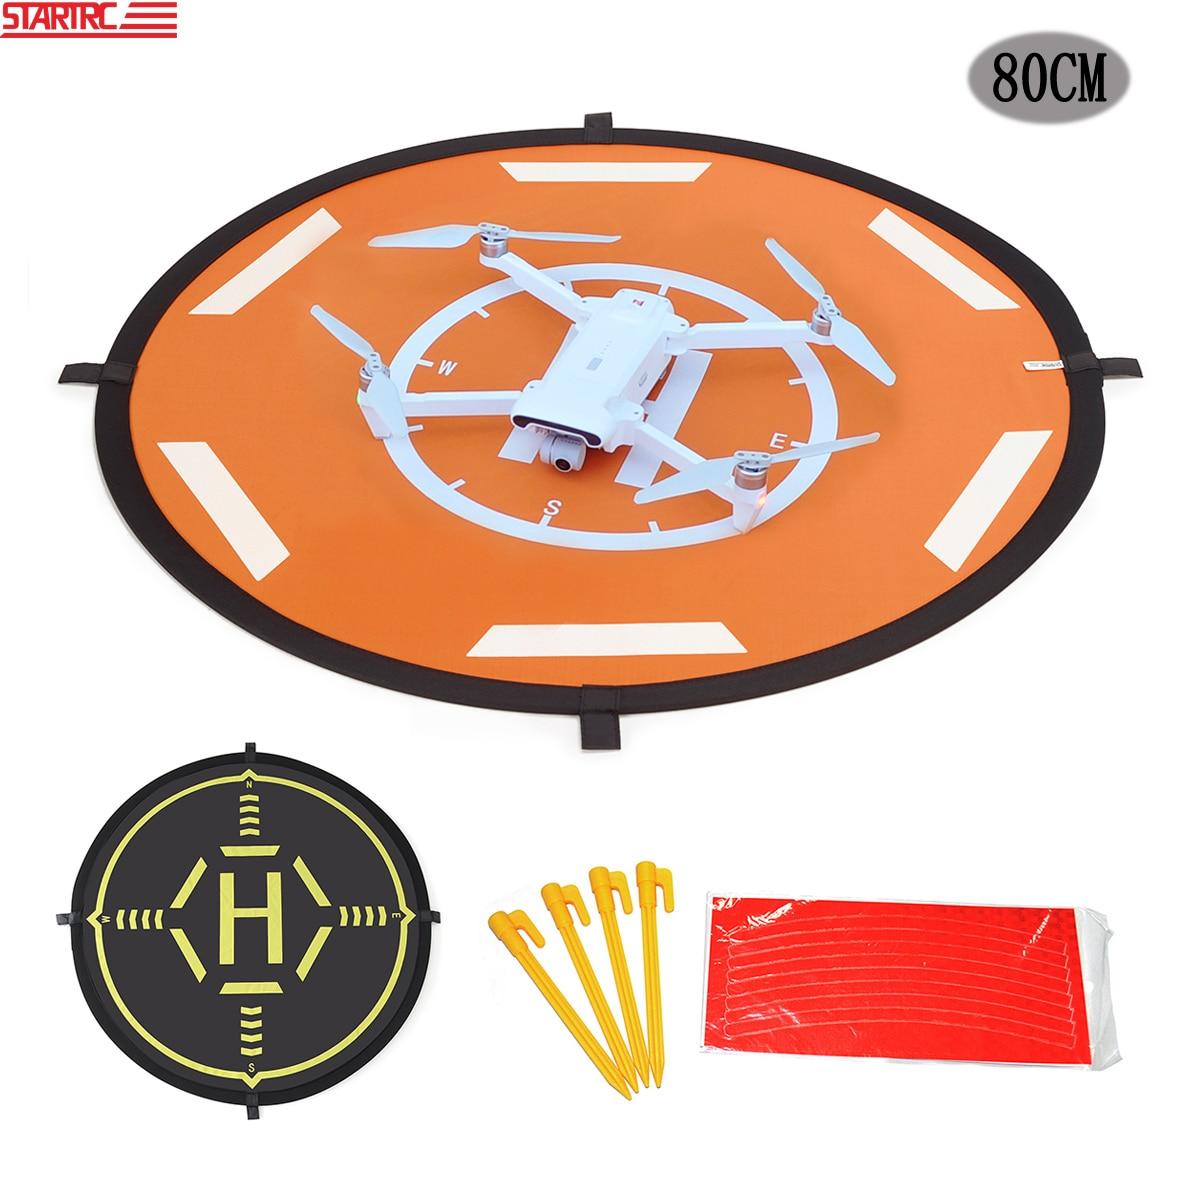 STARTRC FIMI X8 SE Landing pad safely landing 80CM For XIAO MI FIMI X8 SE   4K   A3 Accessories